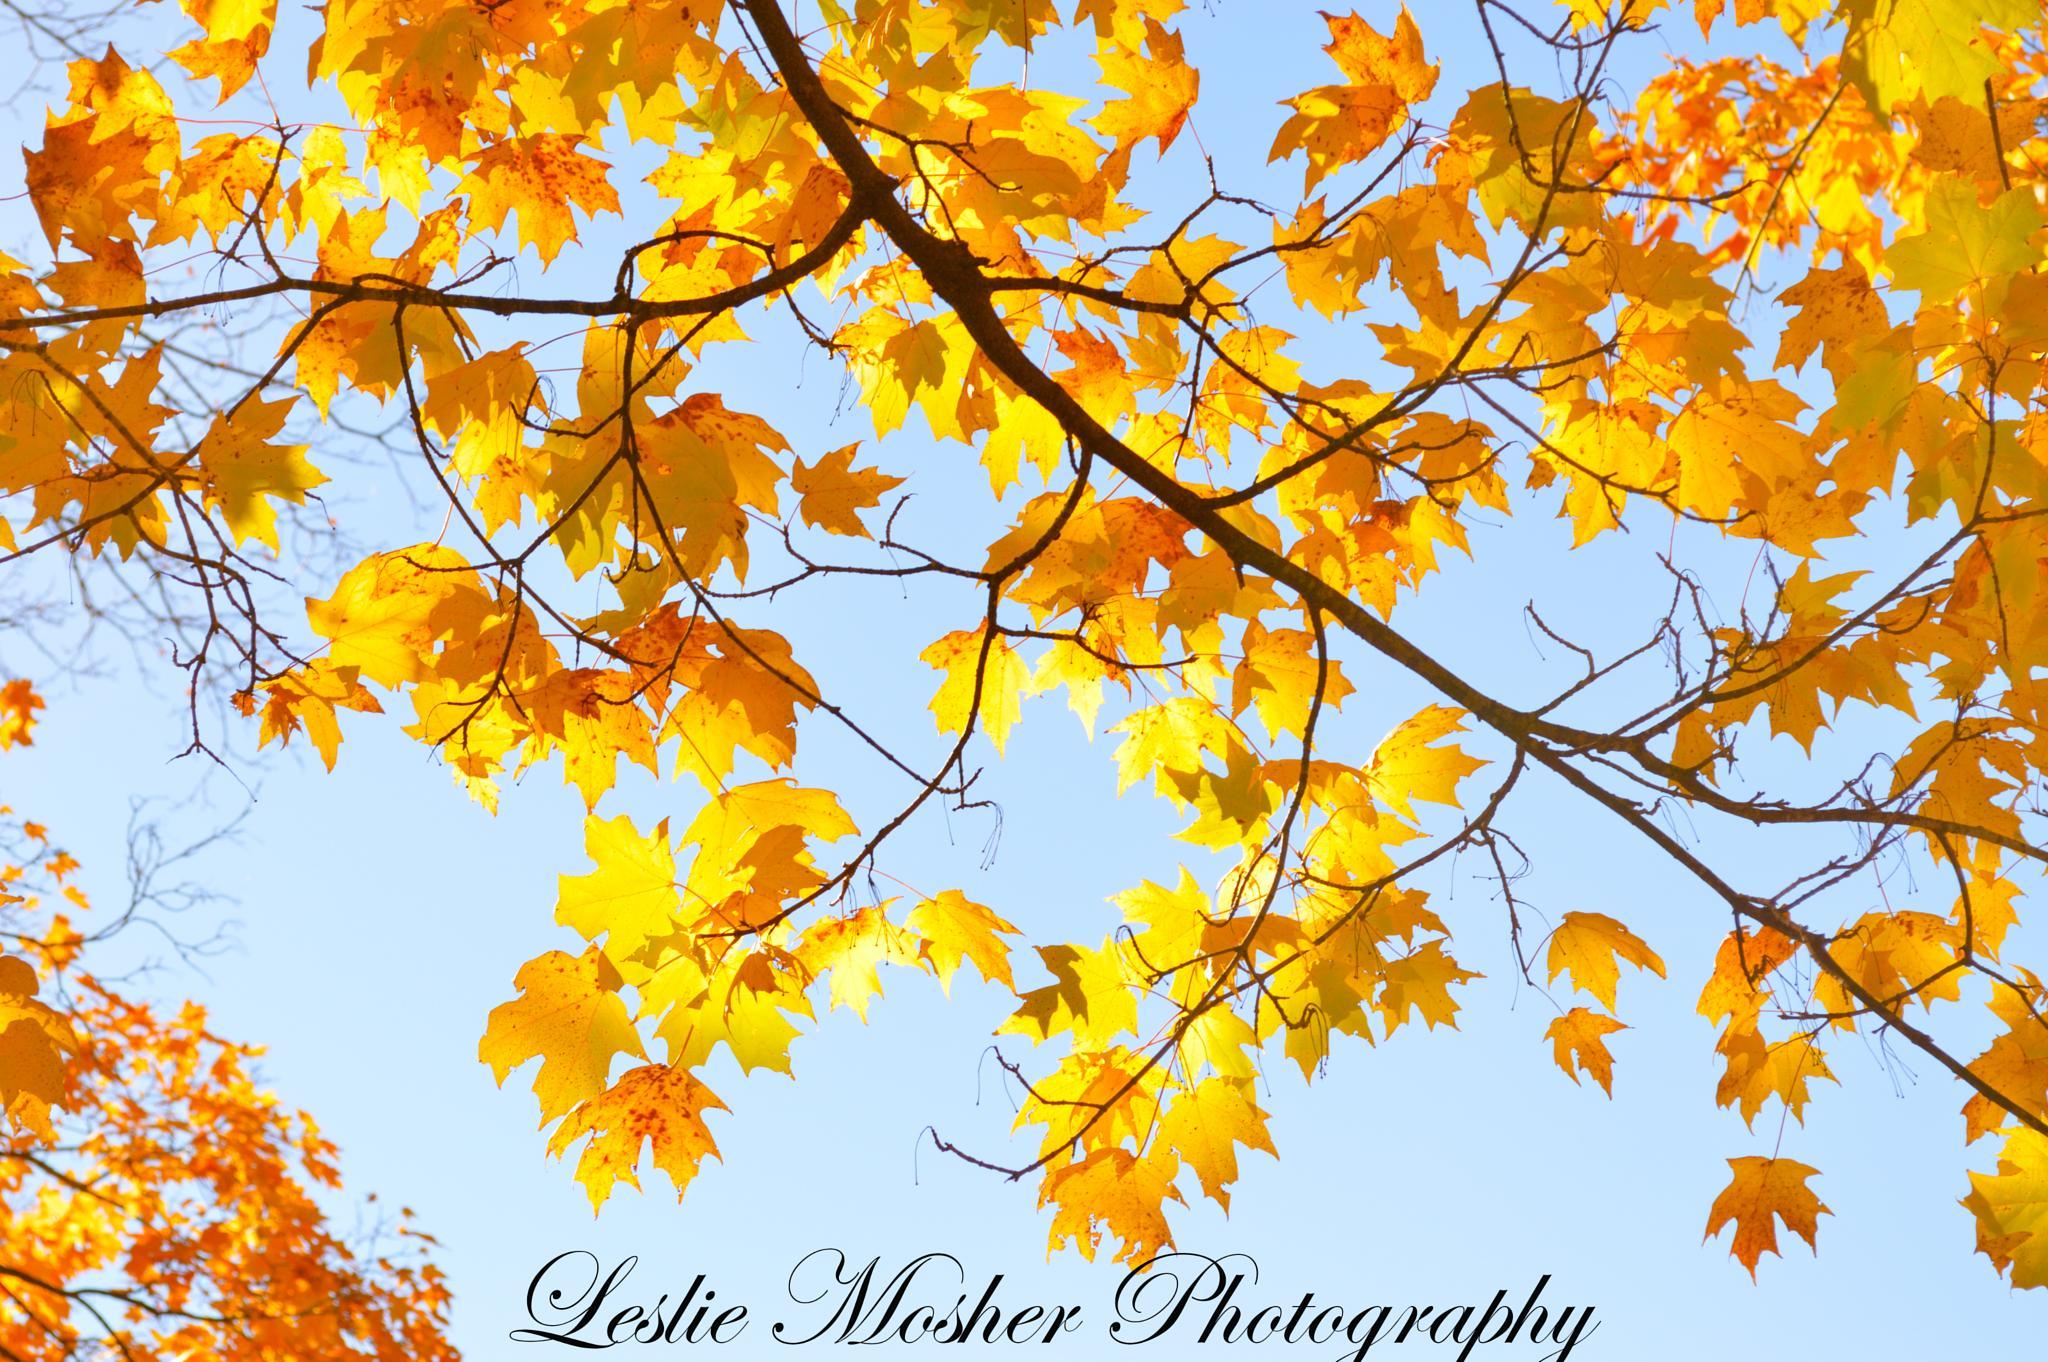 Untitled by Leslie Mosher